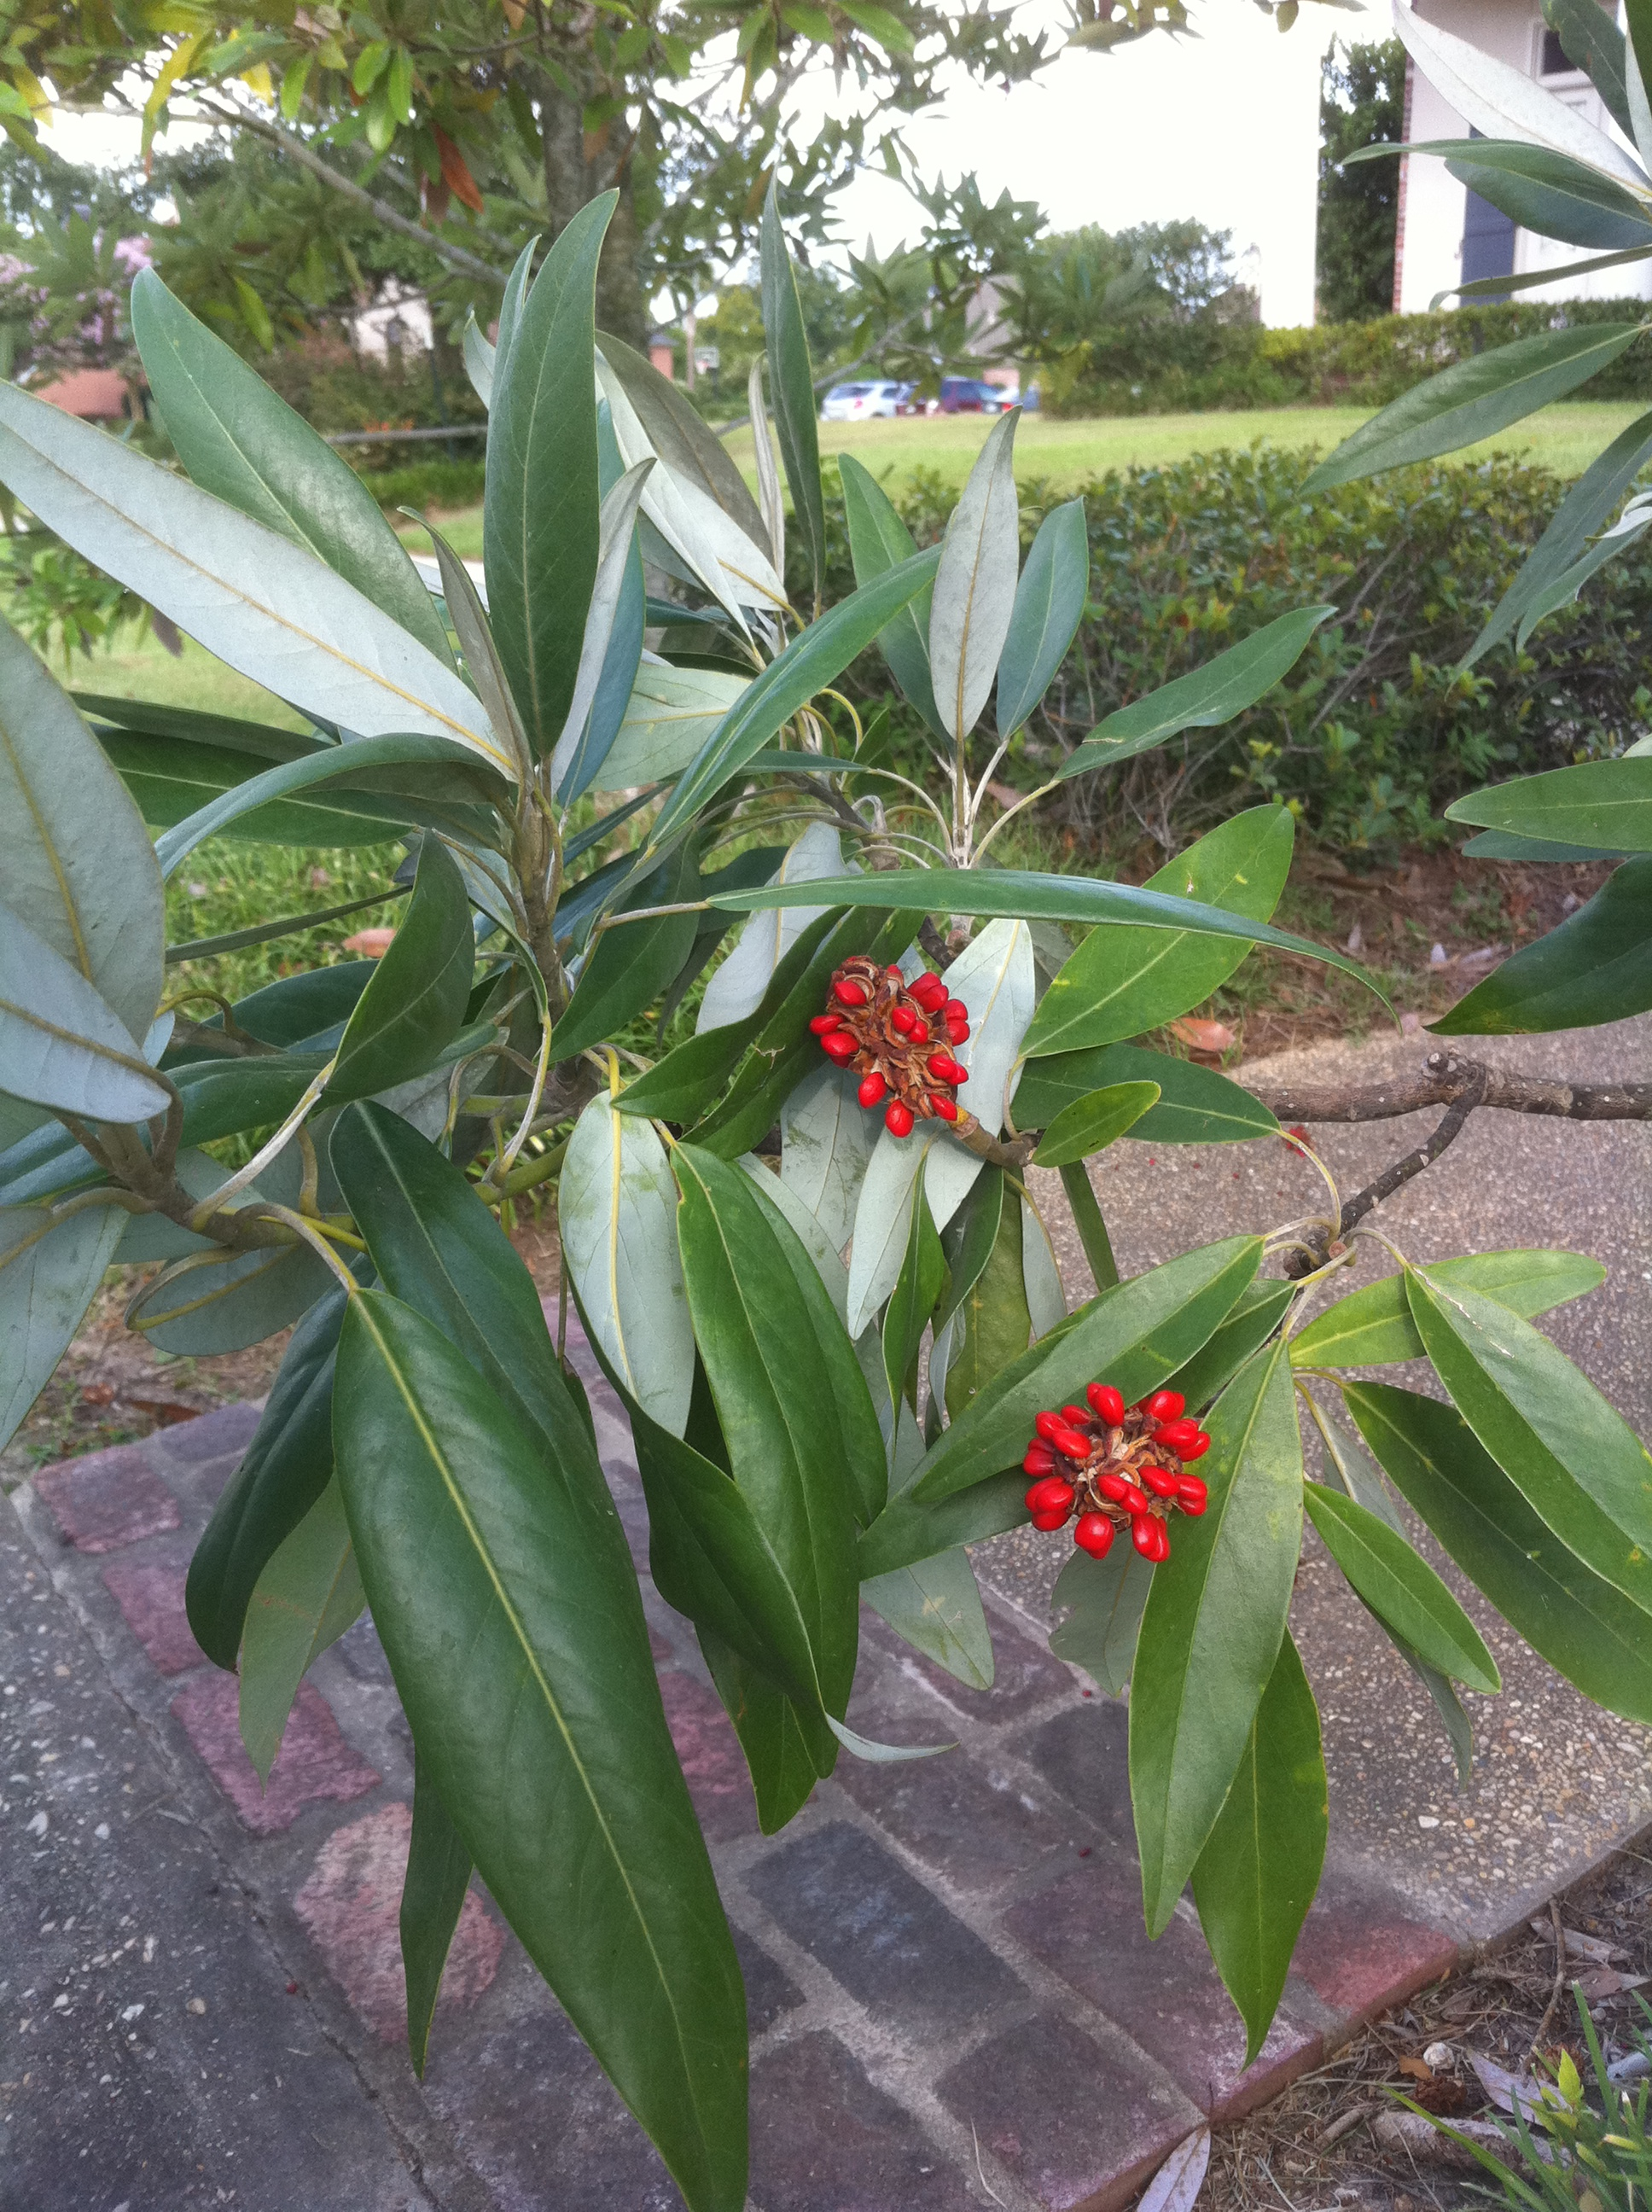 Ogrod I Taras Magnolia Virginiana Sweetbay Magnolia Tree Seeds